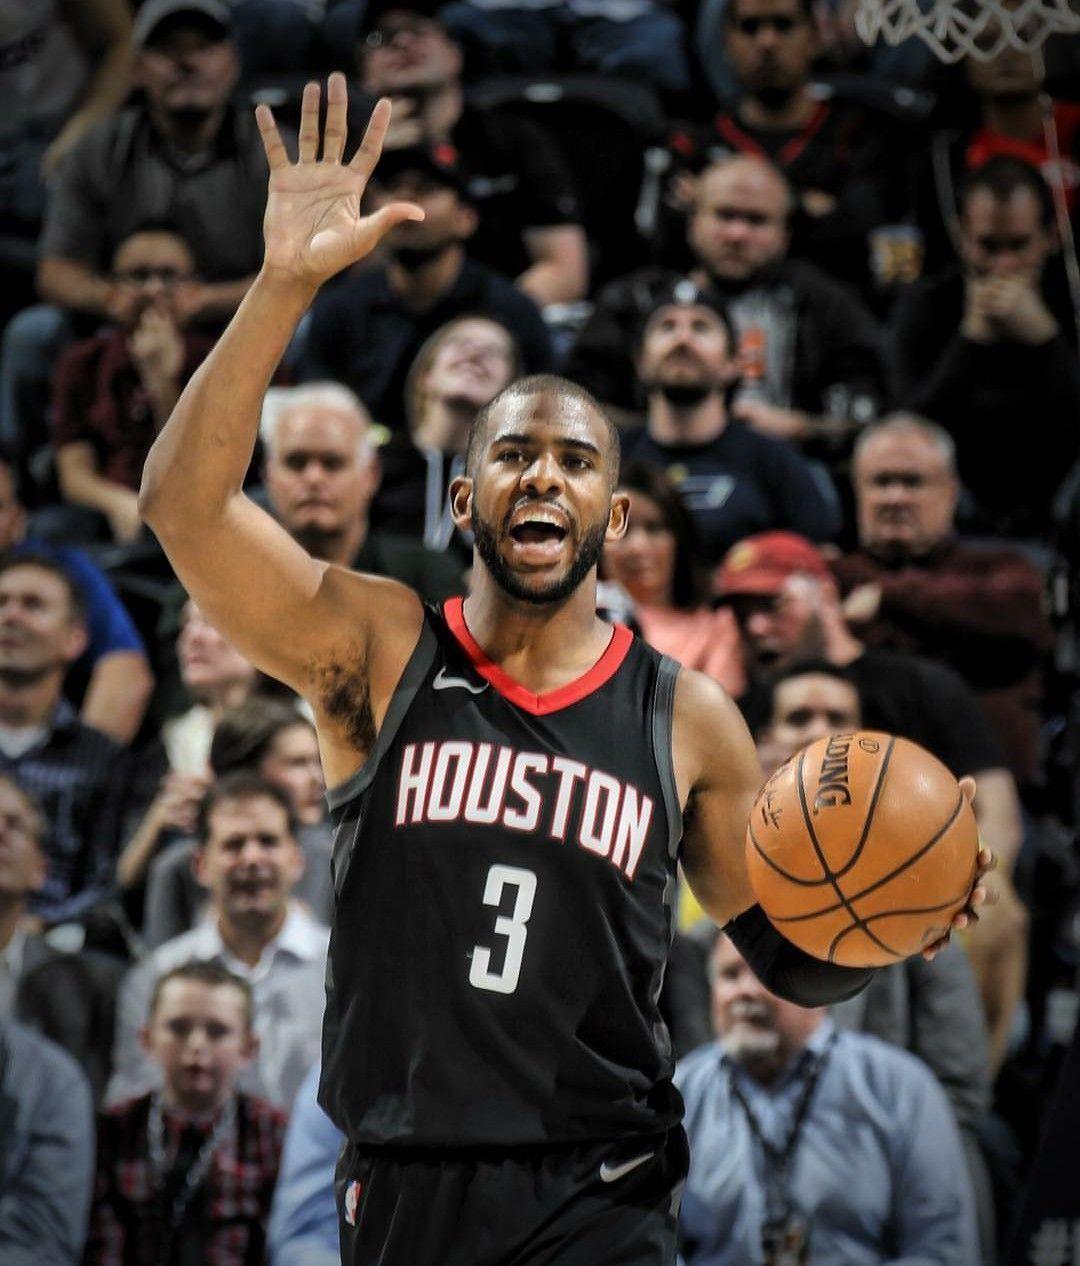 Chris Paul Houston Rockets ballislife basketball bball